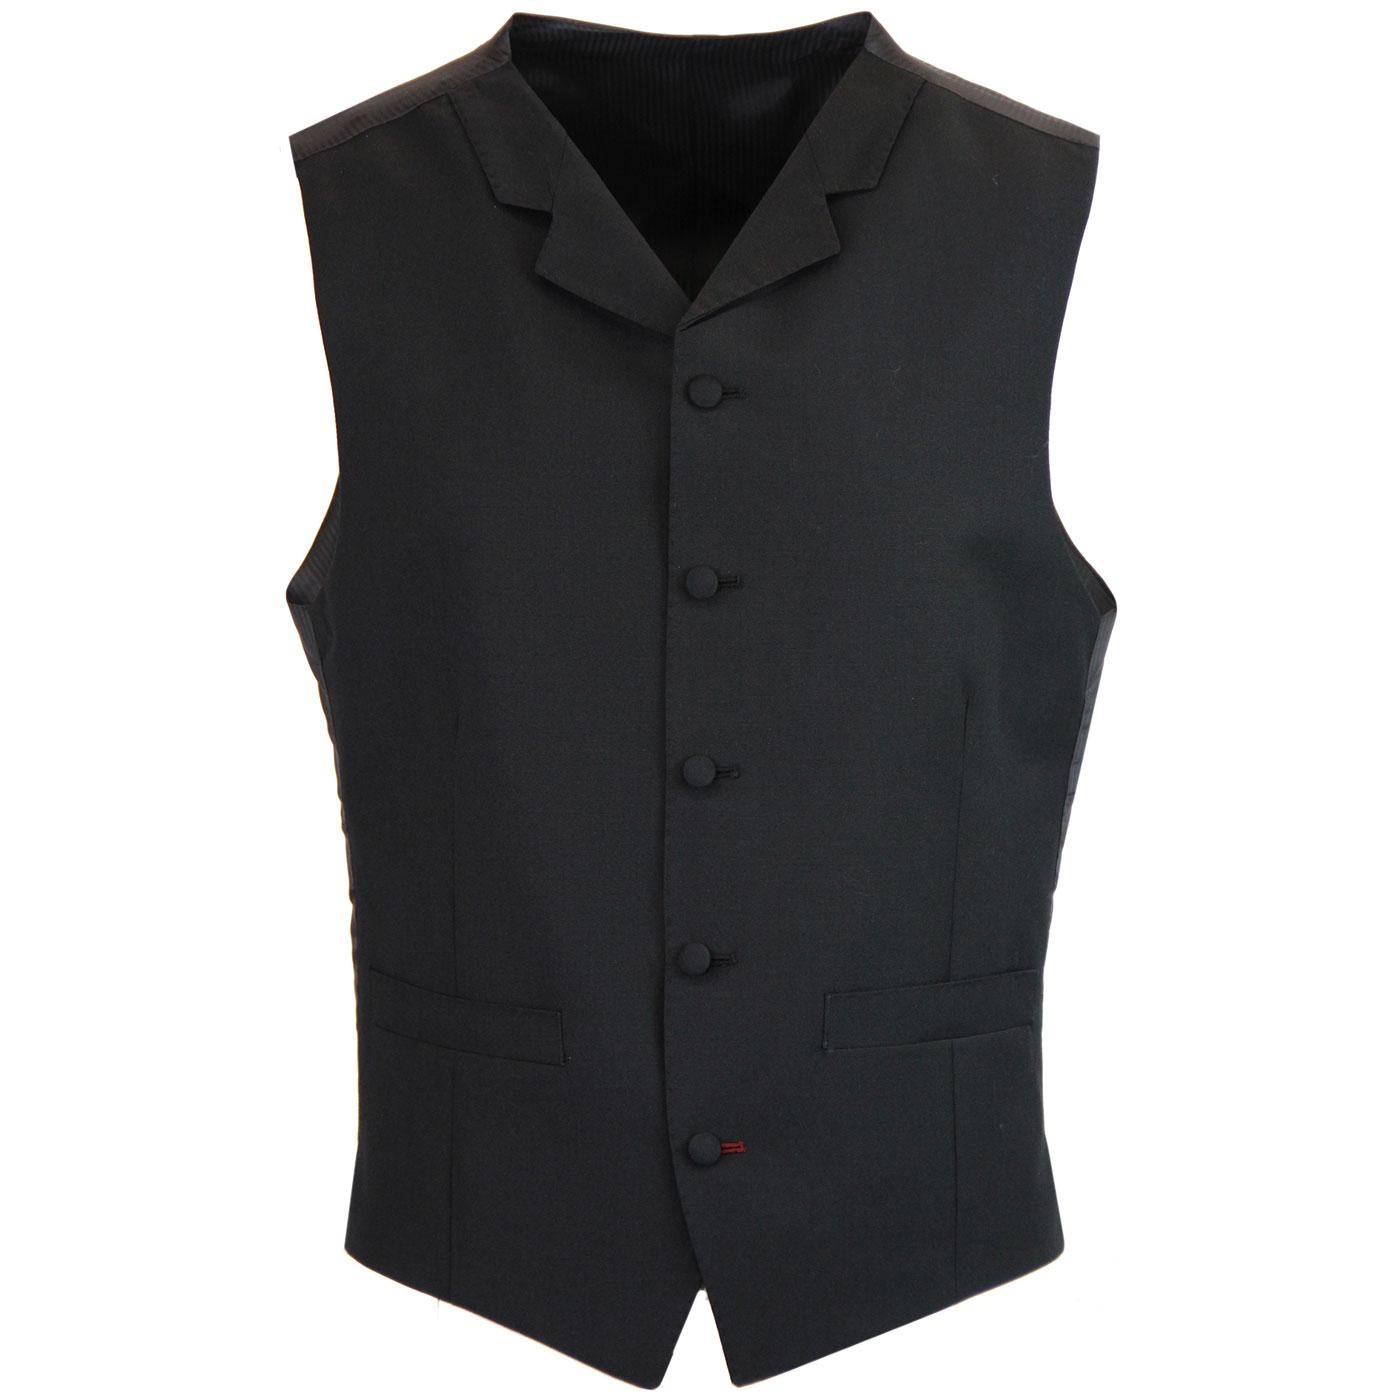 MADCAP ENGLAND Mod Mohair Lapel Waistcoat (Black)